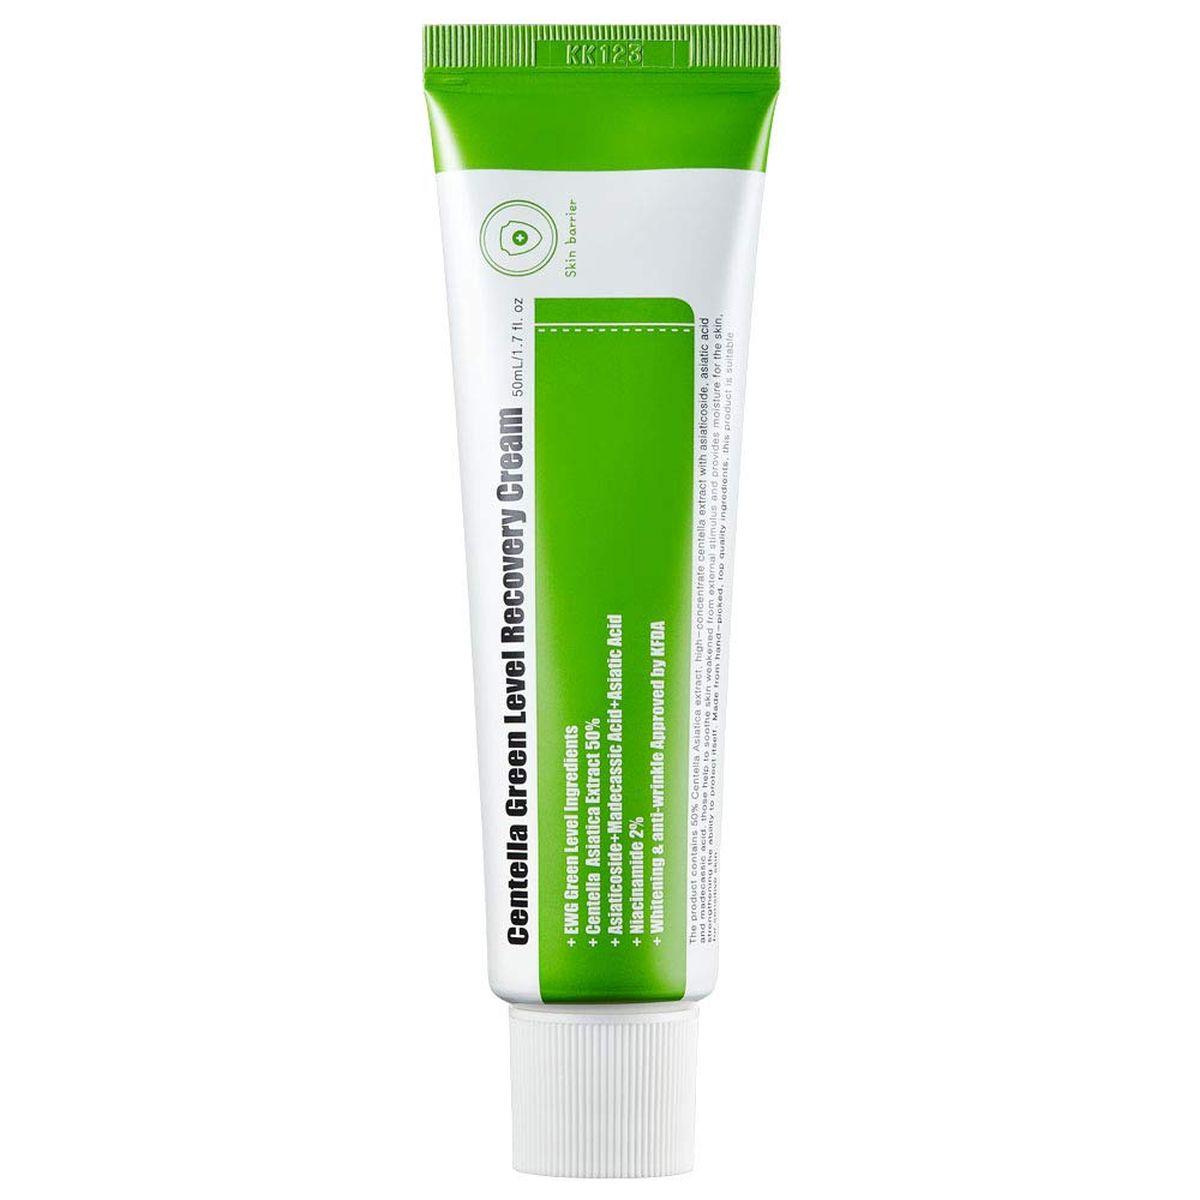 Успокаивающий крем с центеллой PURITO Centella Green Level Recovery Cream - 50 мл